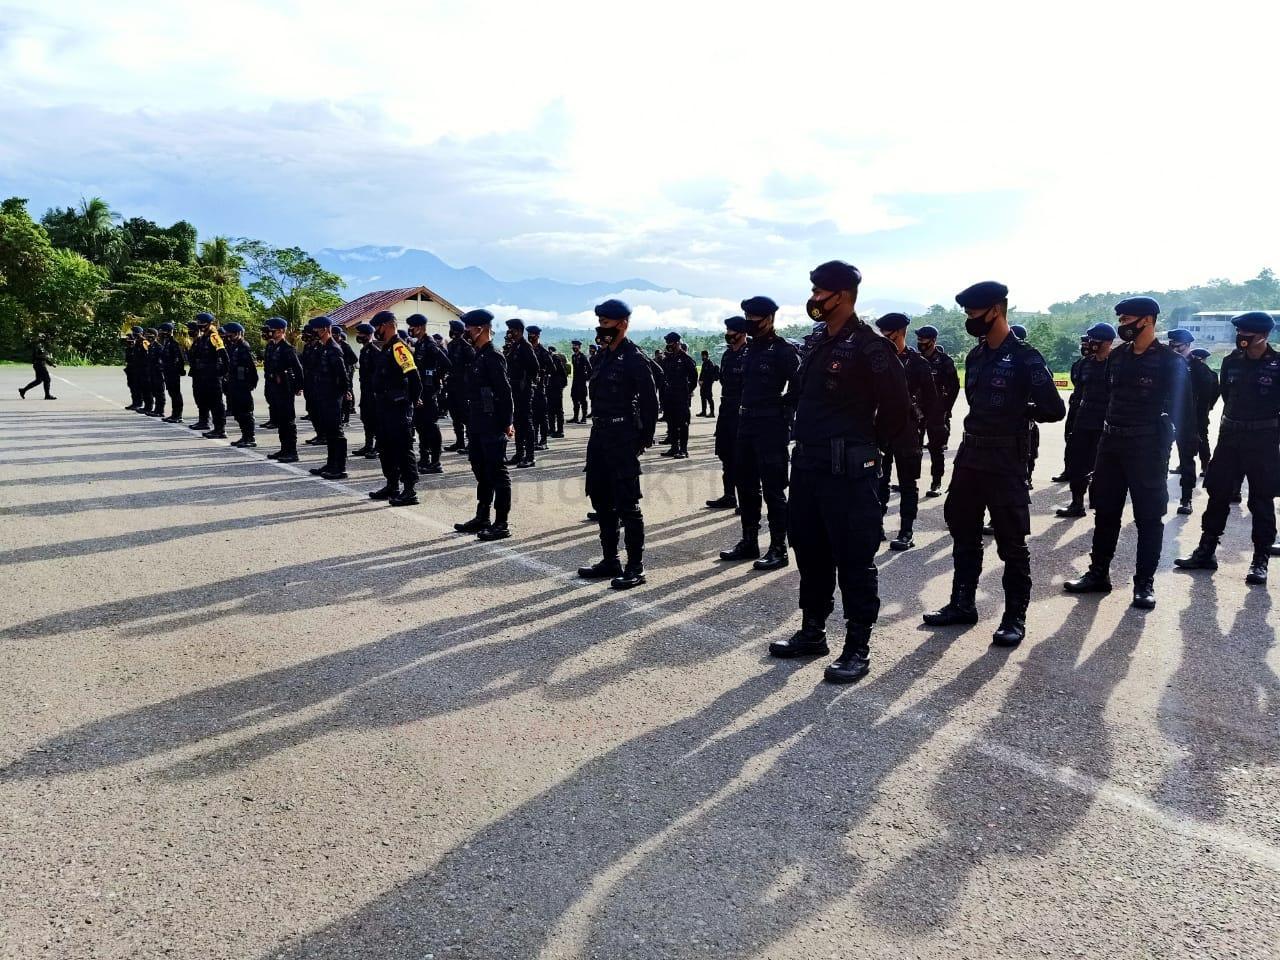 200 Personel Brimob Dari Kelapa Dua Jakarta Tiba di Papua Barat 2 IMG 20201206 WA0025